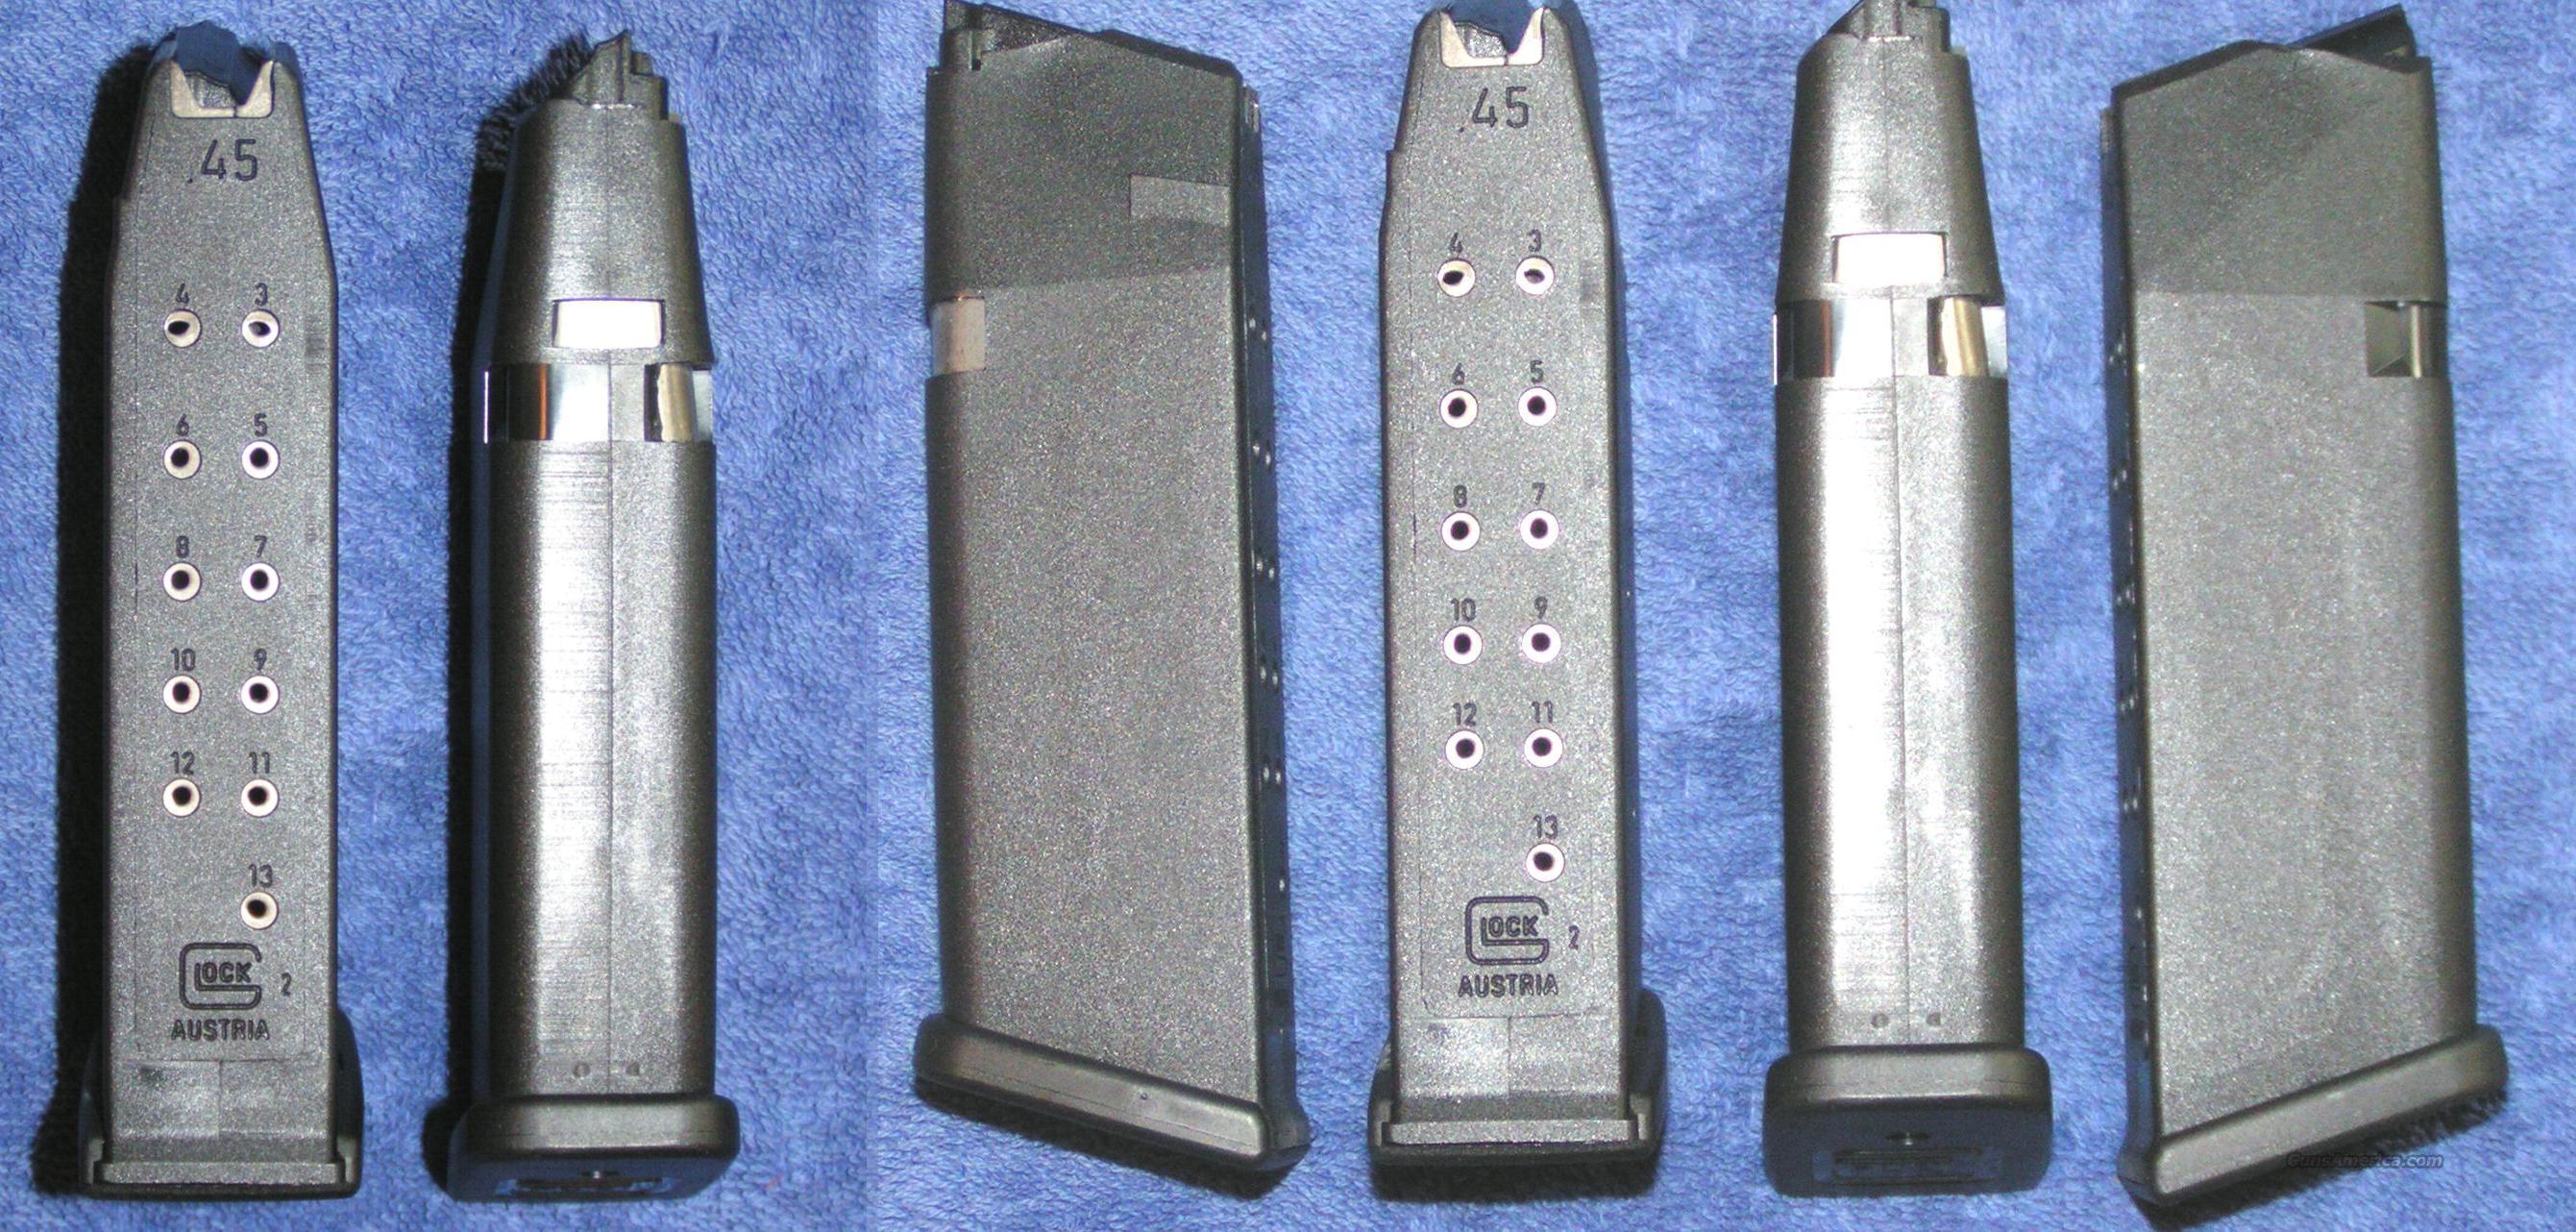 6 Glock 21 mags Factory 45ACP 13rd Gen 4 Free ship $23 each  Non-Guns > Magazines & Clips > Pistol Magazines > Glock